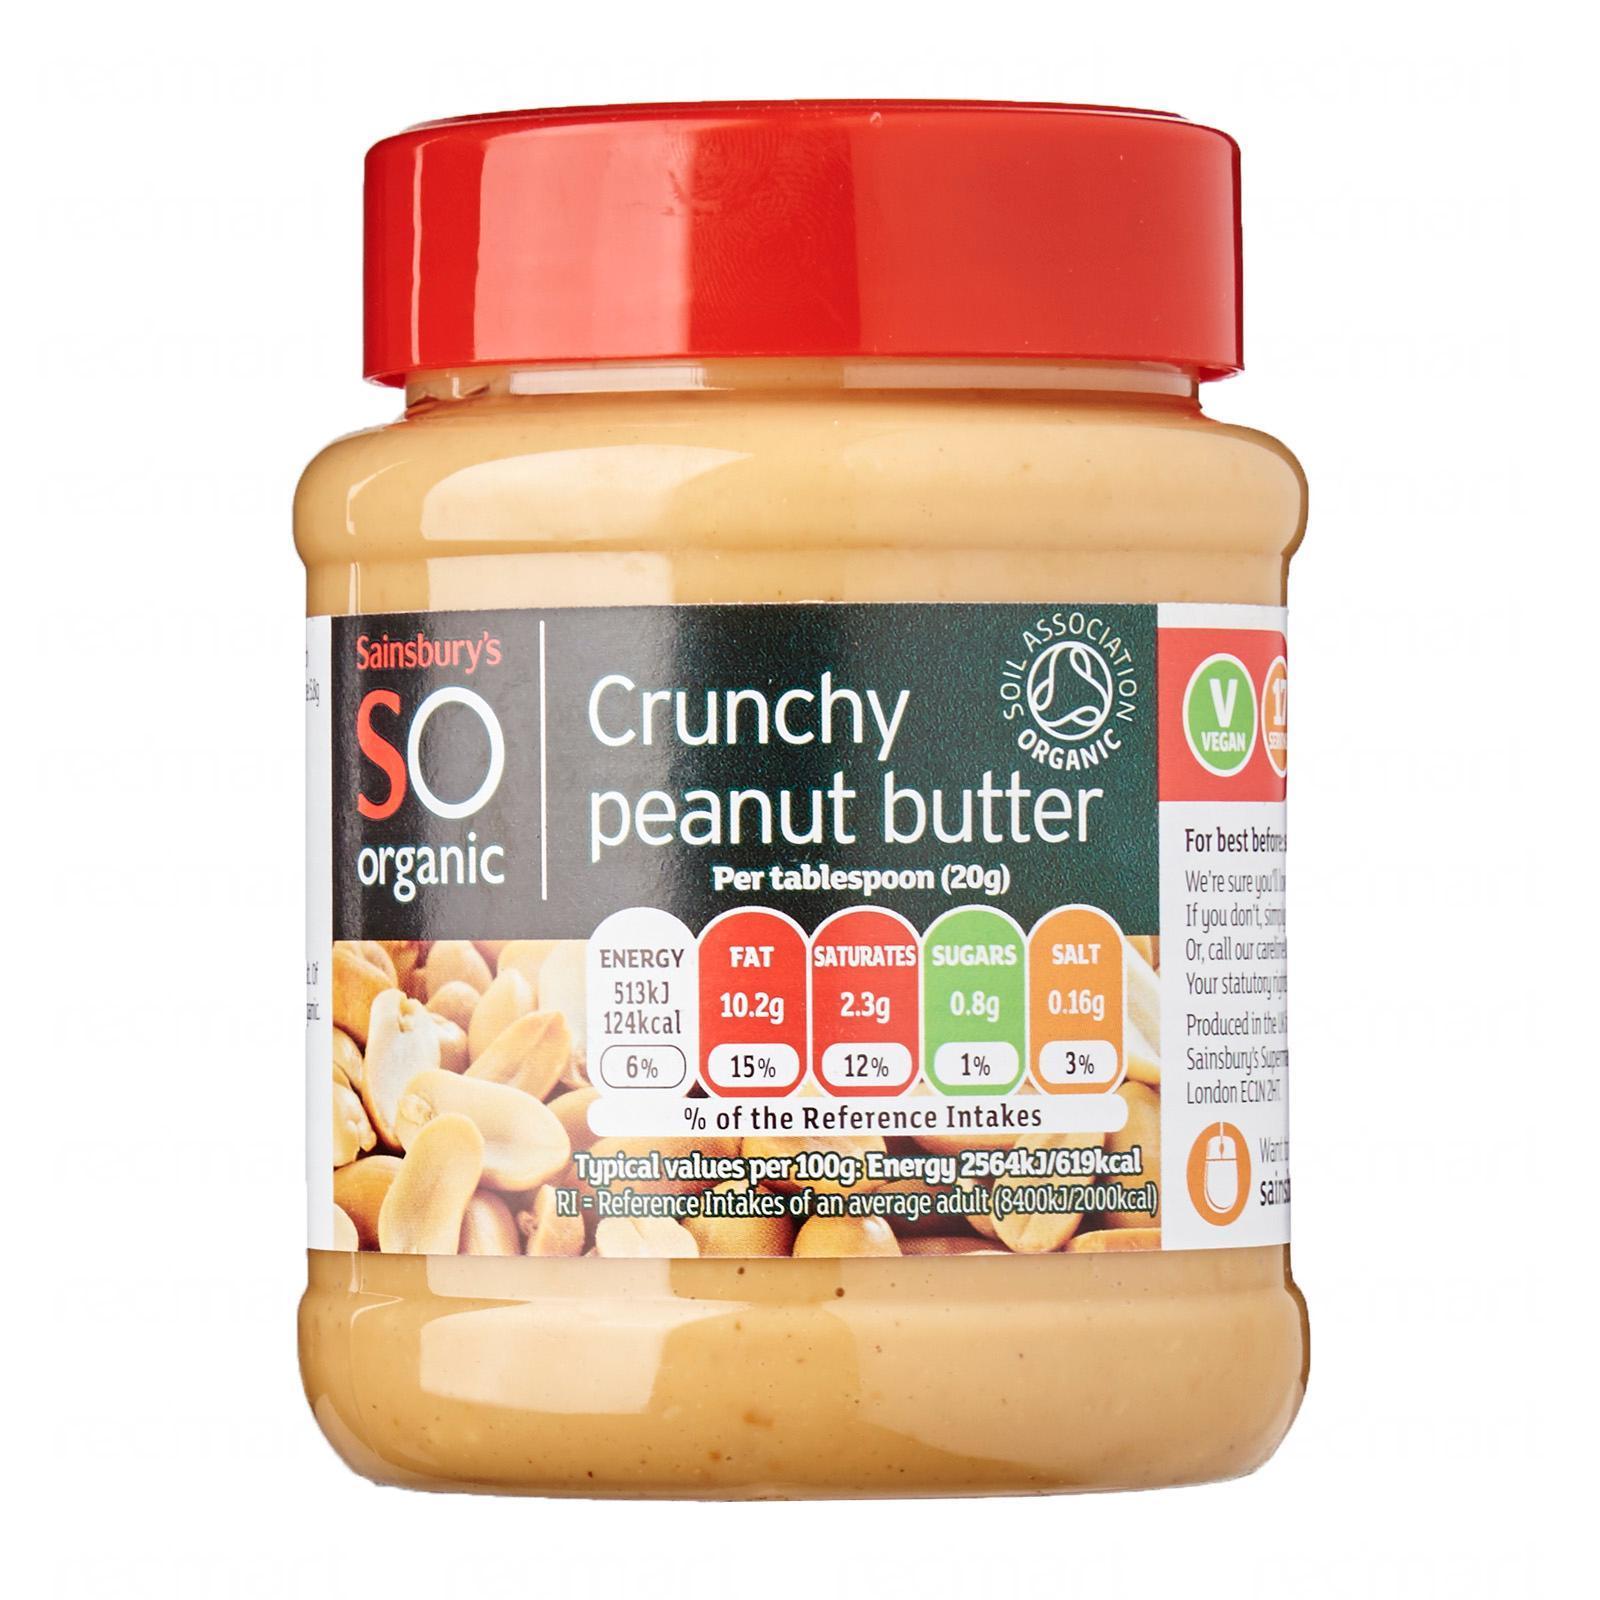 Sainsbury's Organic Peanut Butter Crunchy